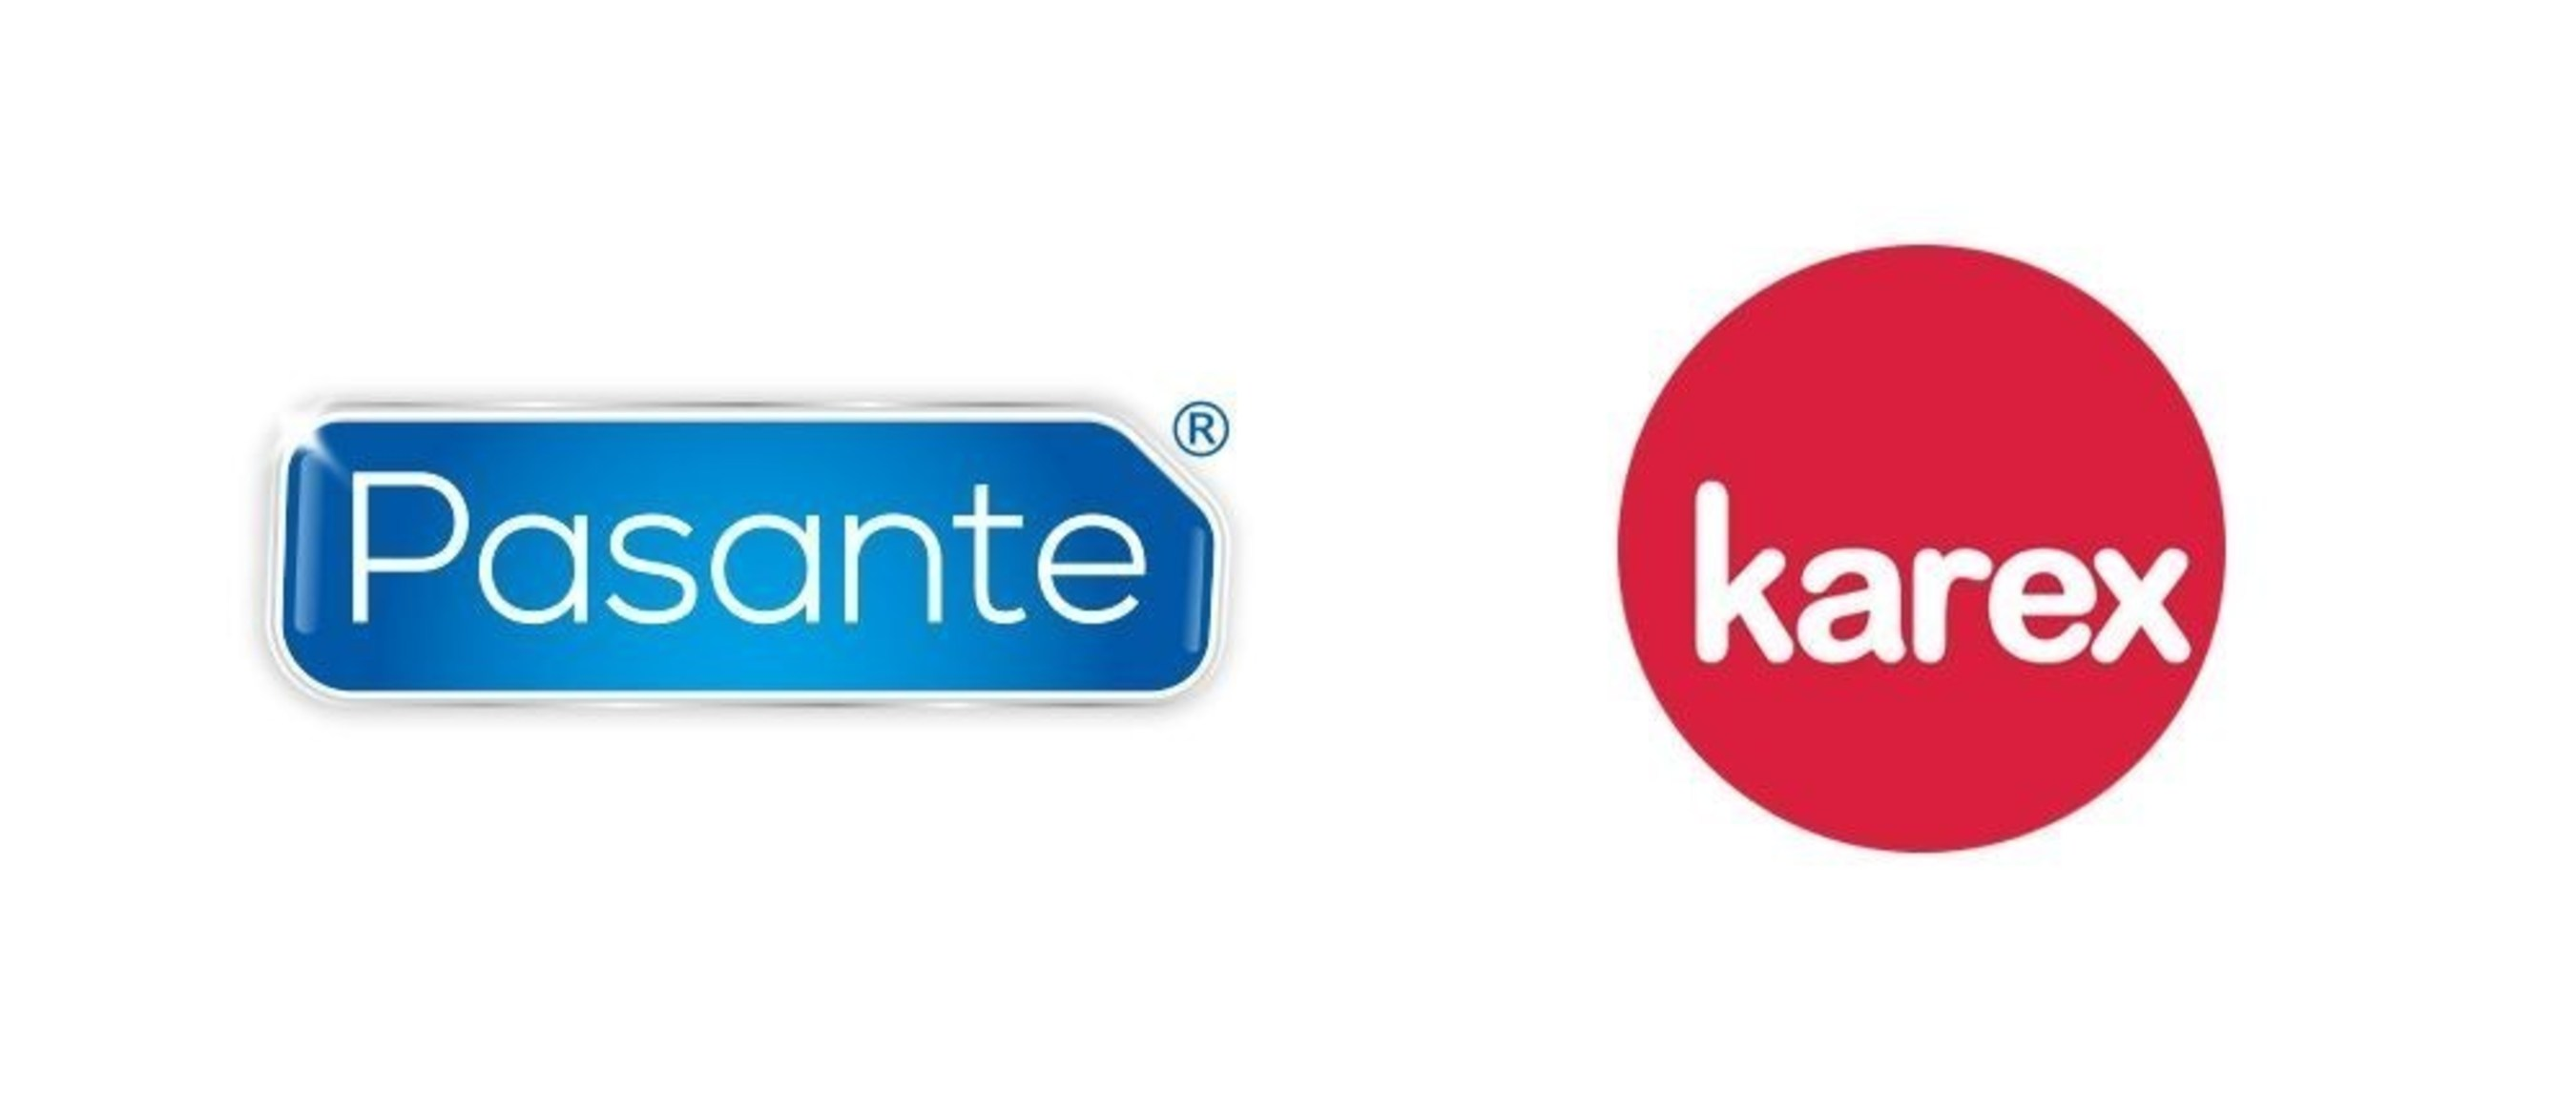 Pasante Healthcare Ltd (PRNewsFoto/Pasante Healthcare Ltd)